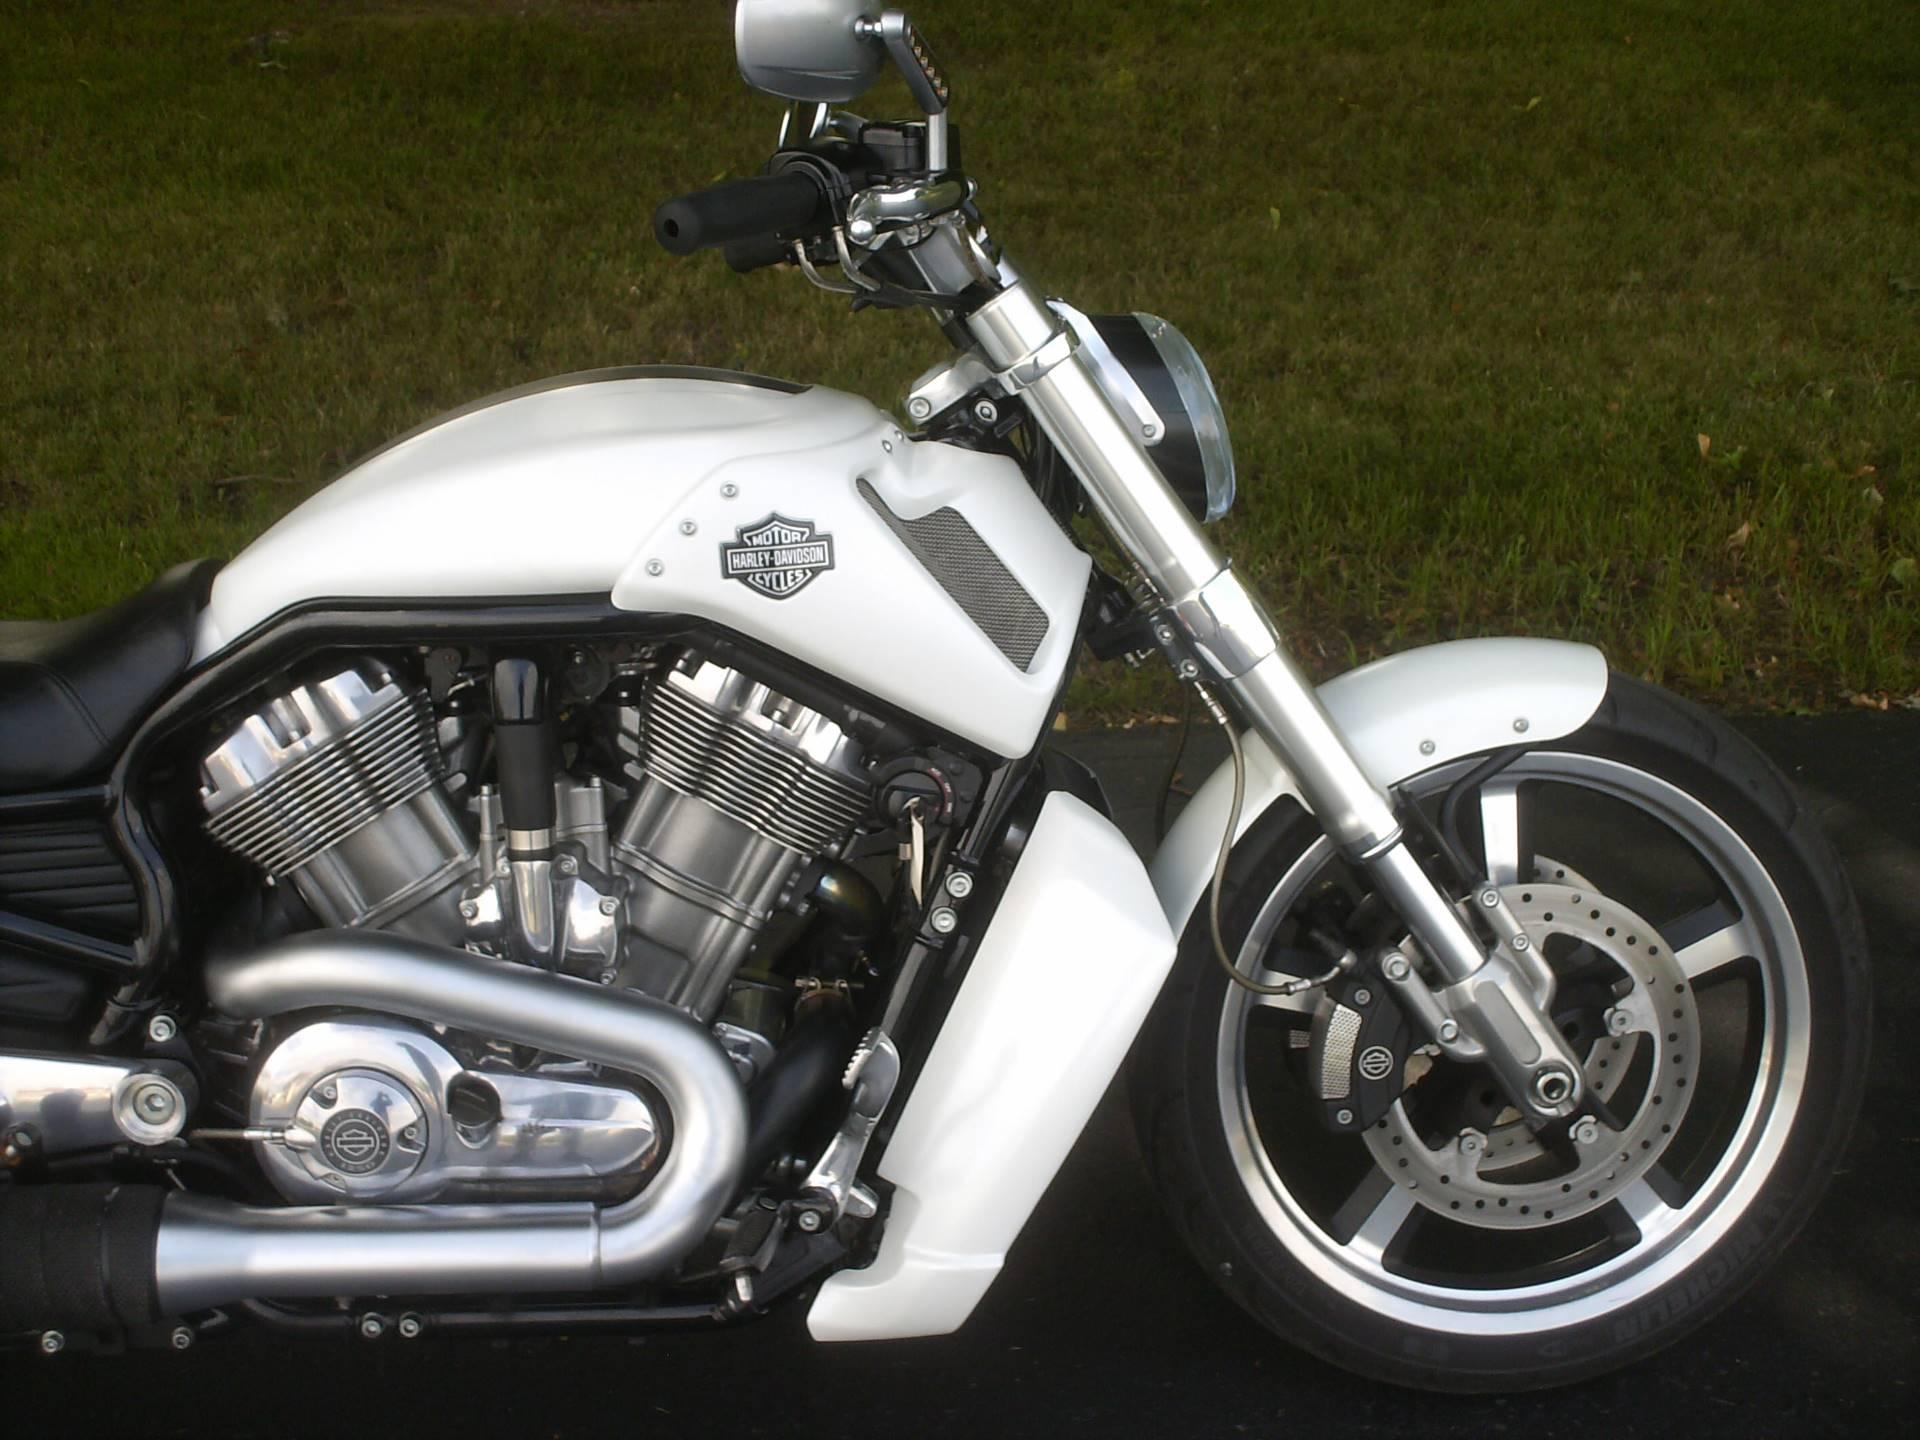 Used 2013 Harley-Davidson V-Rod Muscle® Motorcycles in Mukwonago, WI